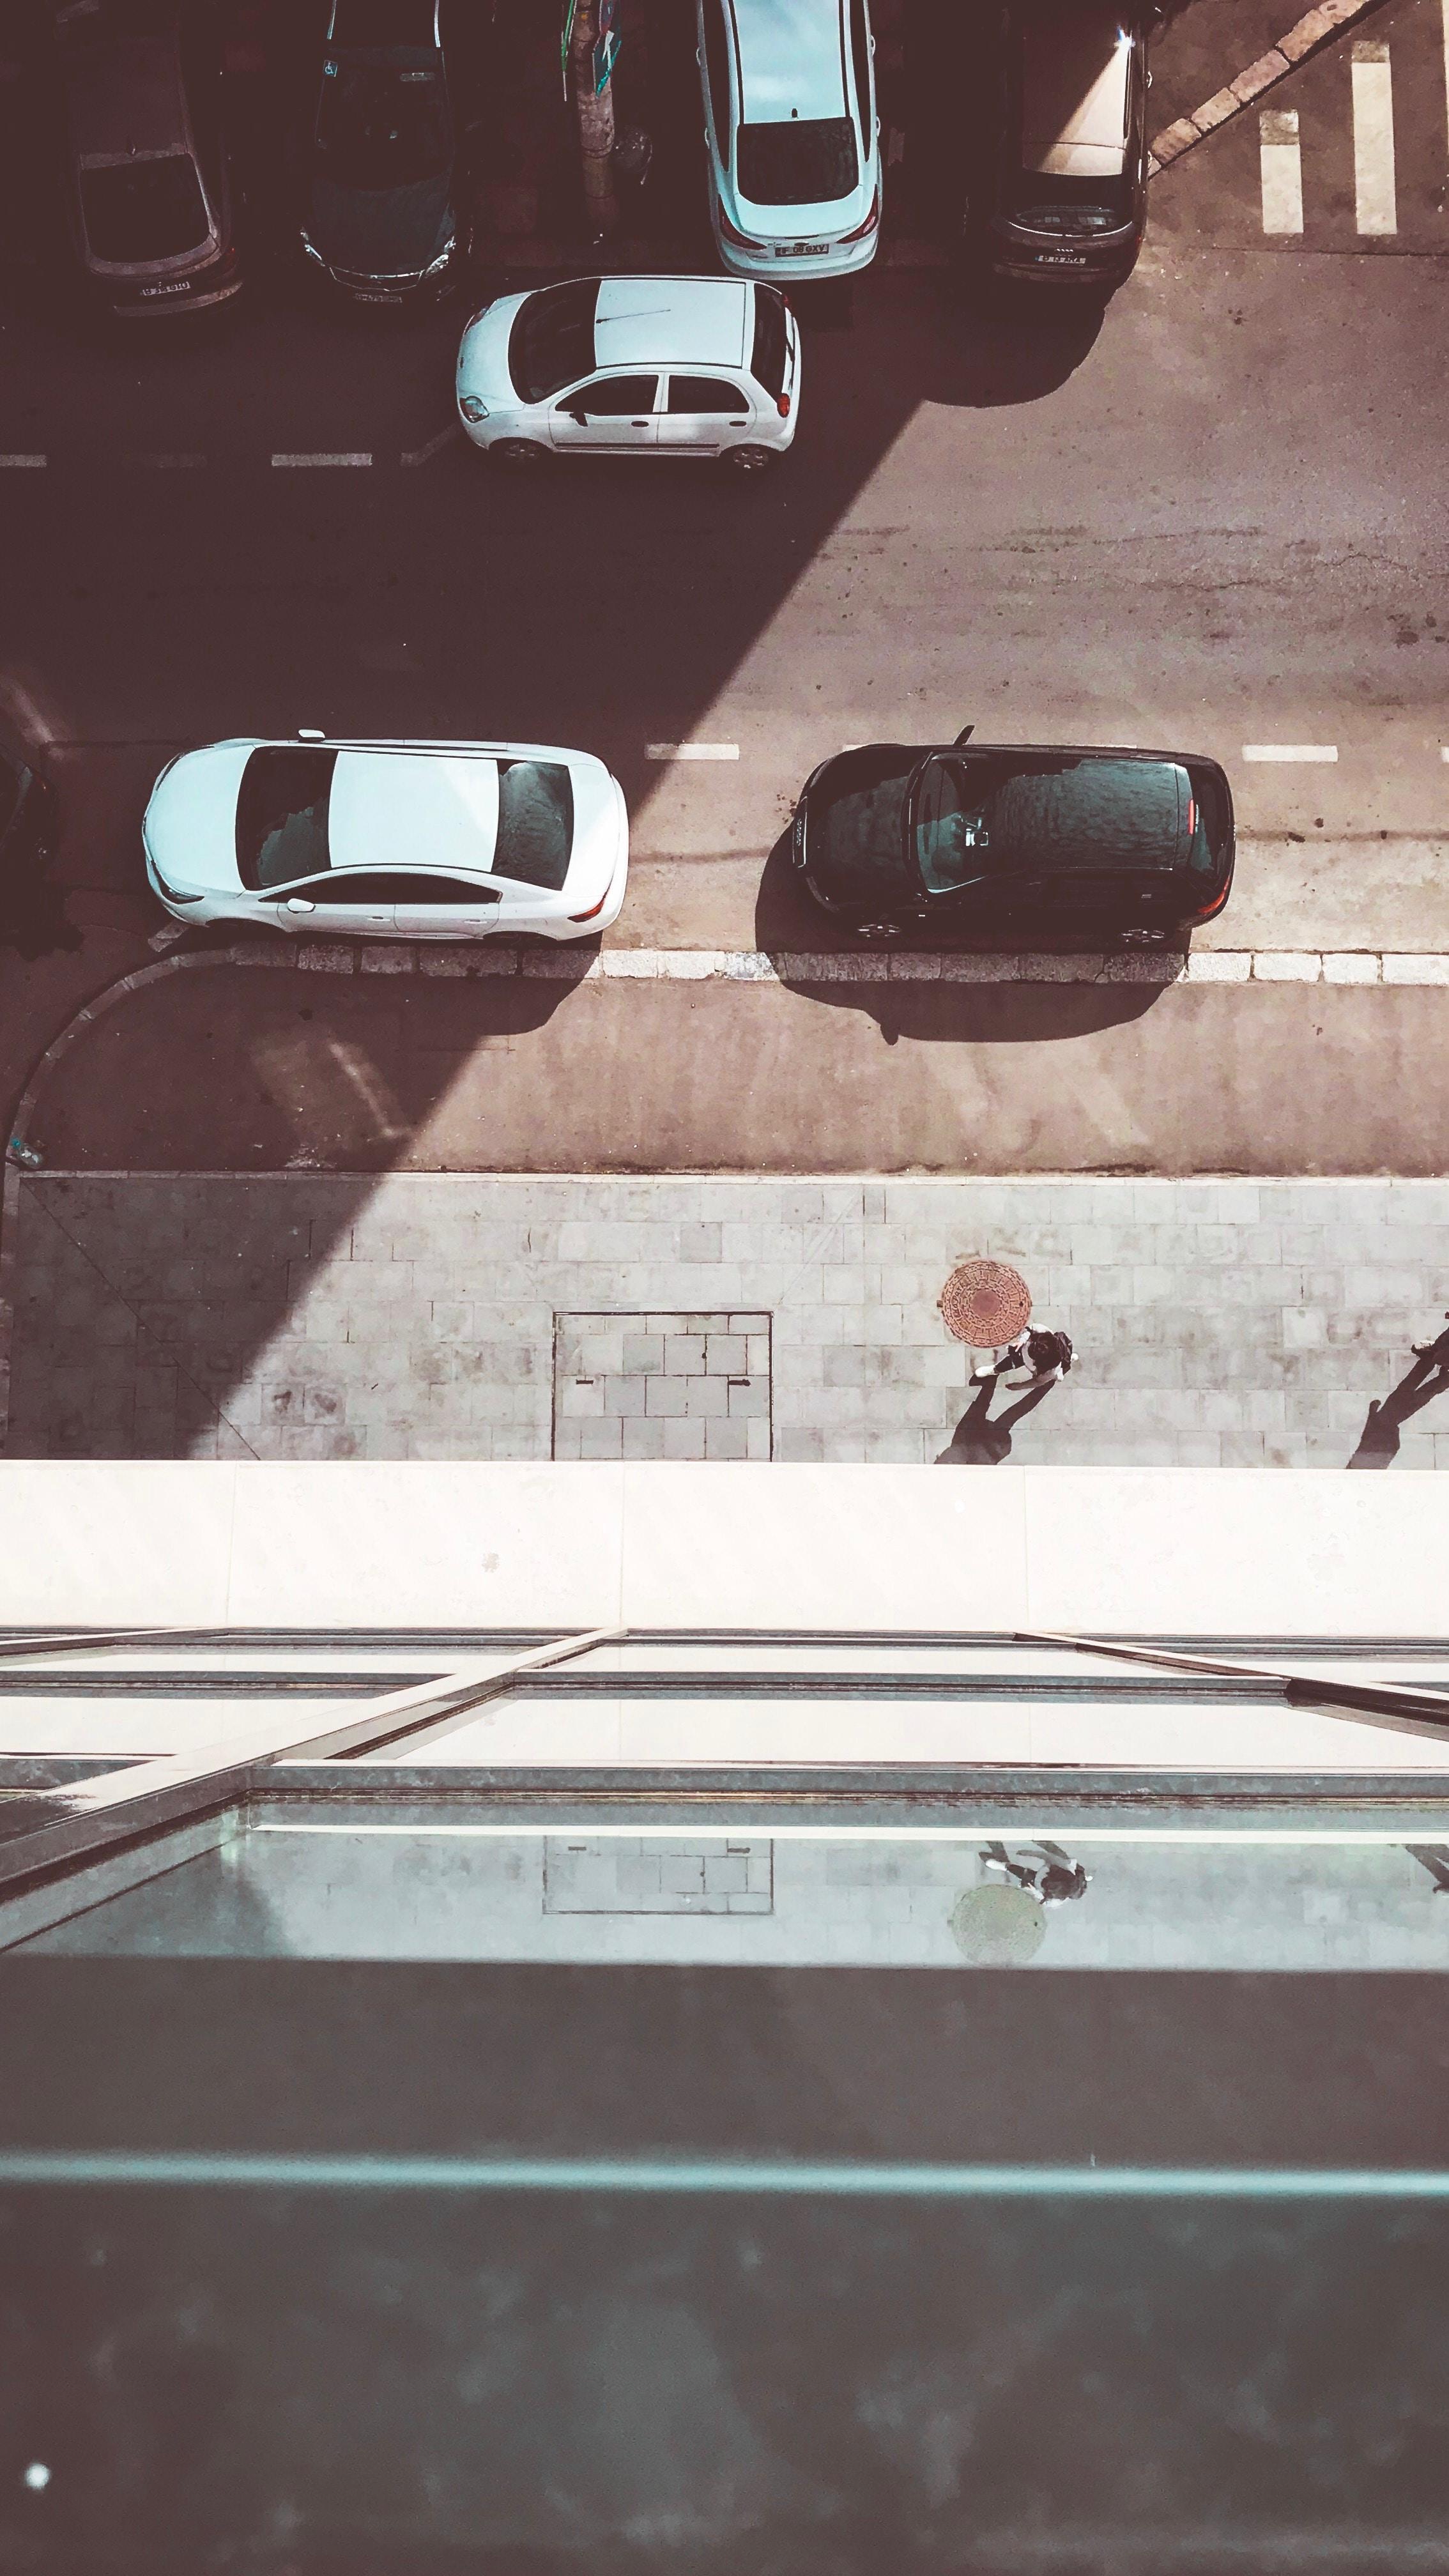 black car front of white car